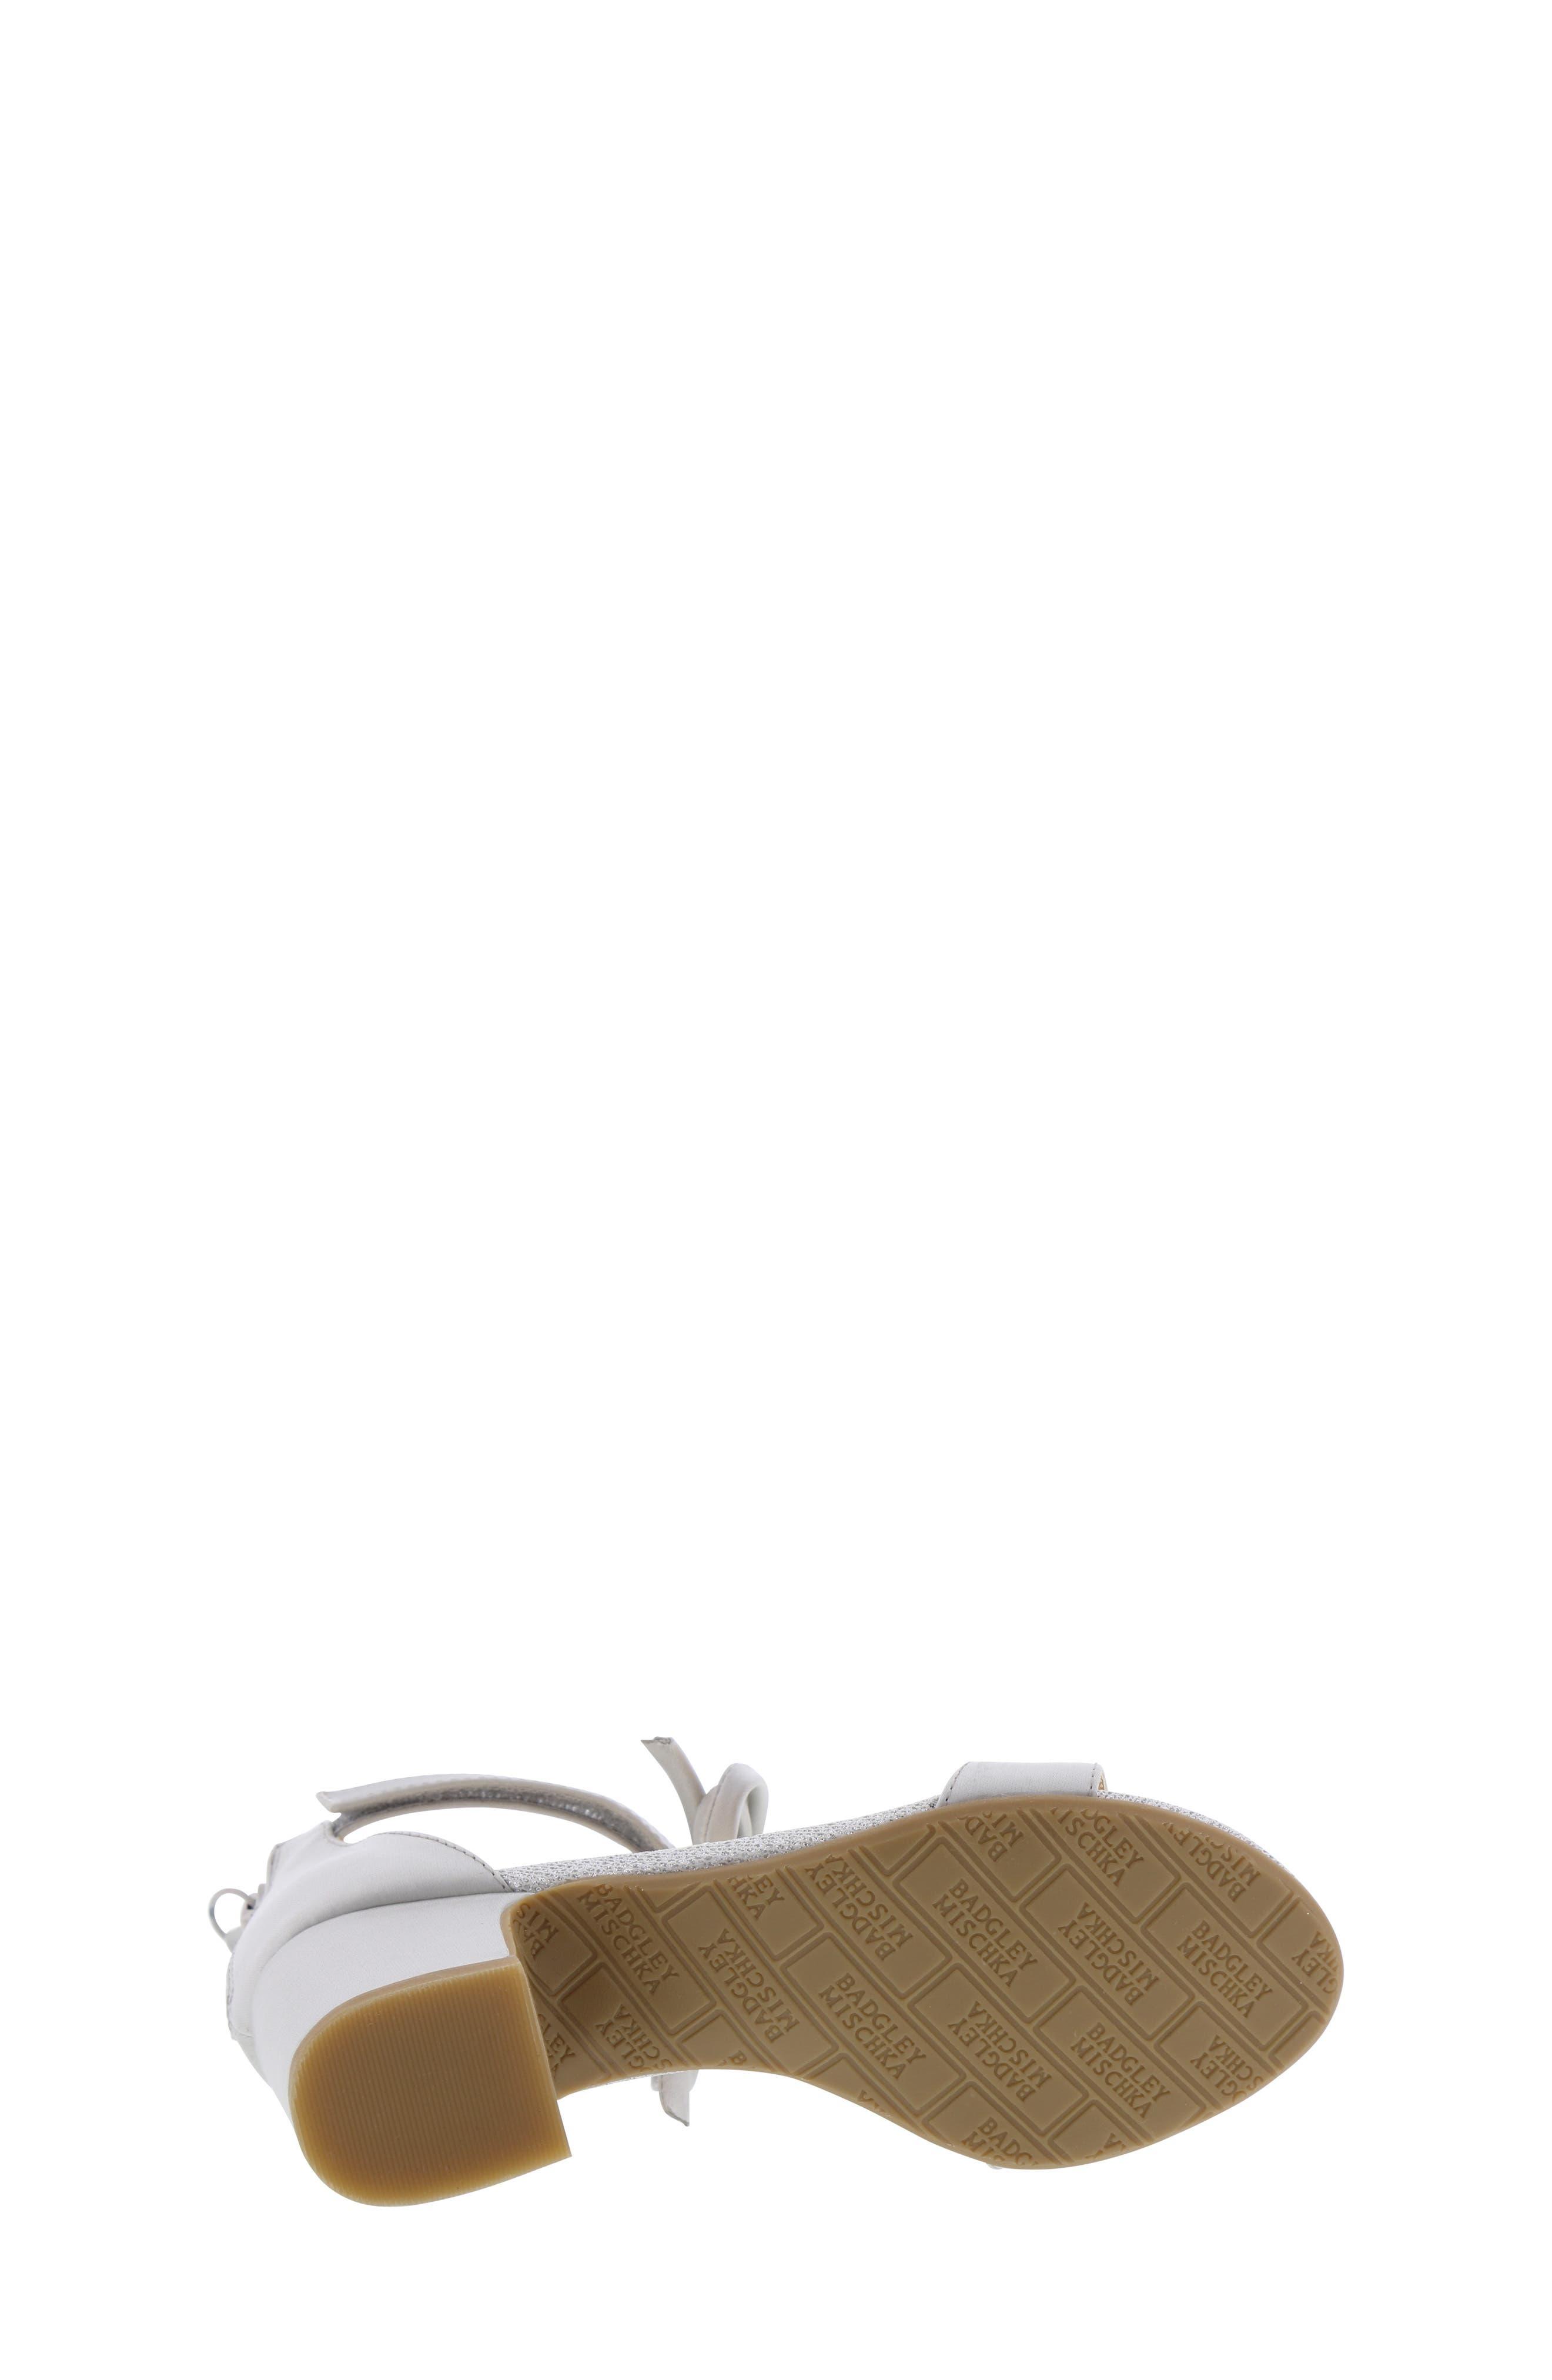 BADGLEY MISCHKA COLLECTION, Badgley Mischka Pernia Embellished Bow Sandal, Alternate thumbnail 6, color, SILVER